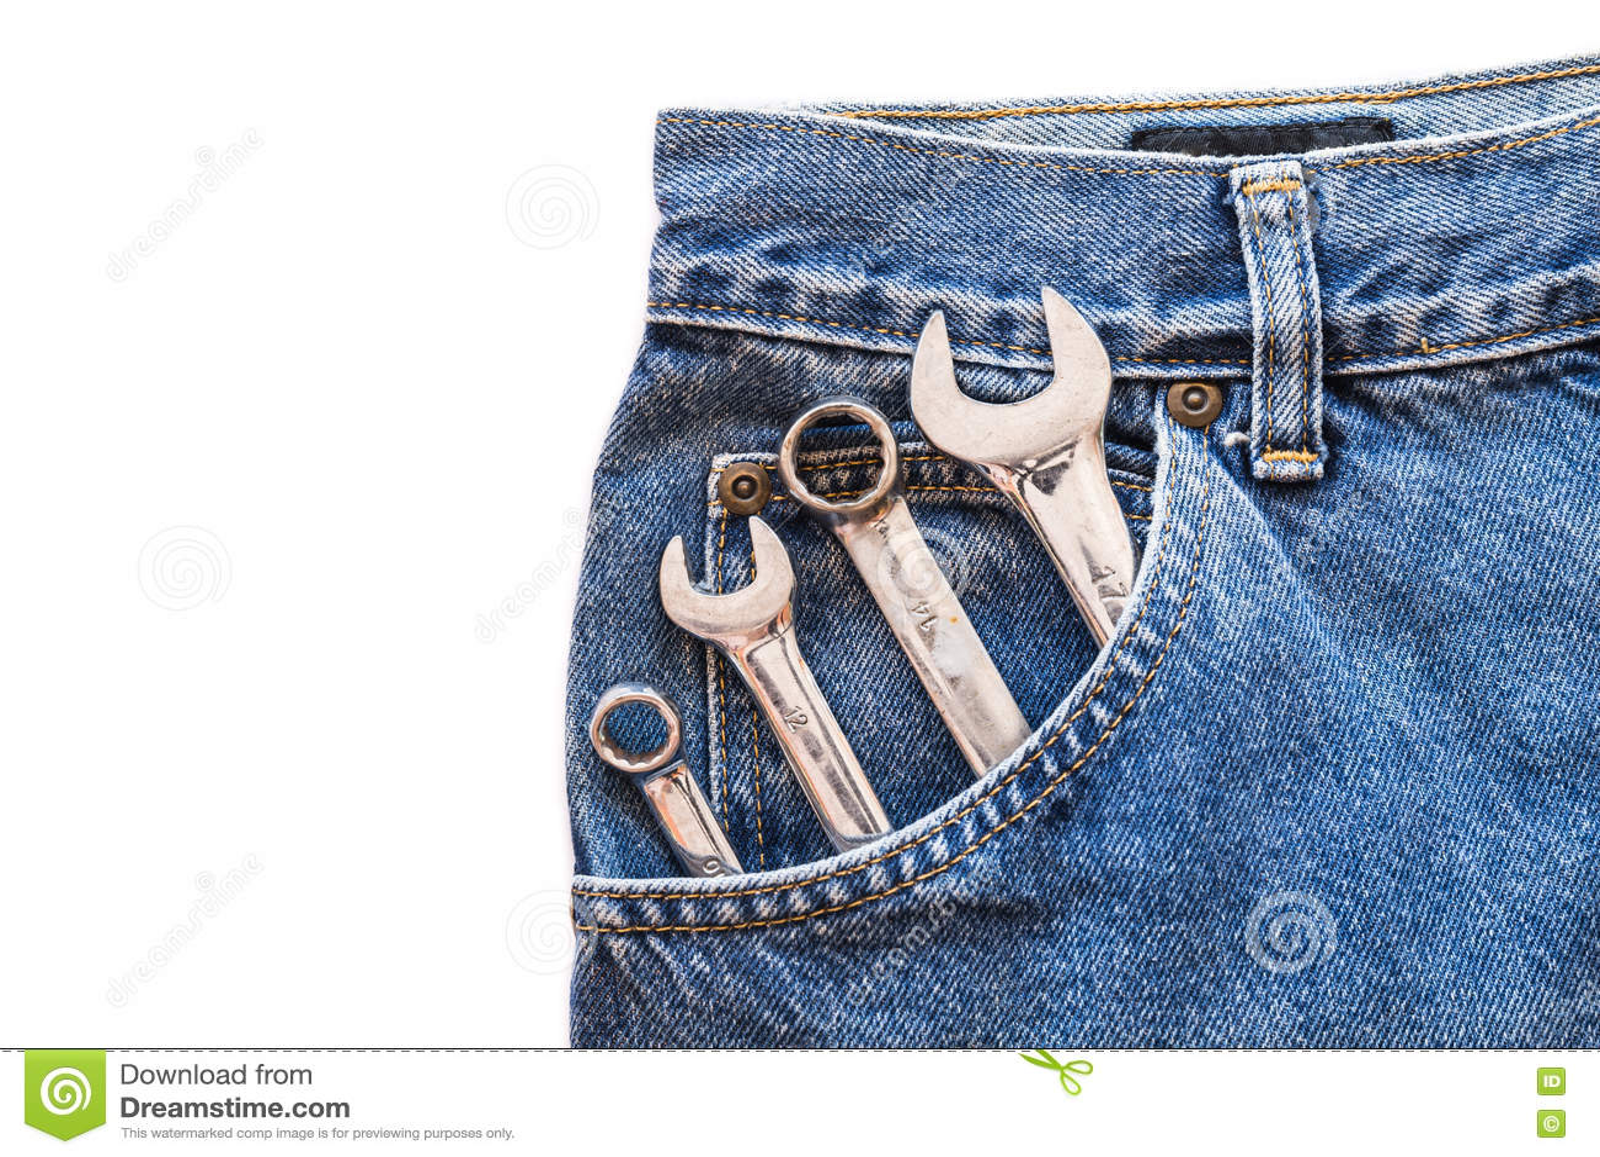 Lug χρωμίου το γαλλικό κλειδί και το κλειδί στην μπροστινή τσέπη τζιν παντελόνι στο λευκό απομόνωσαν το υπόβαθρο